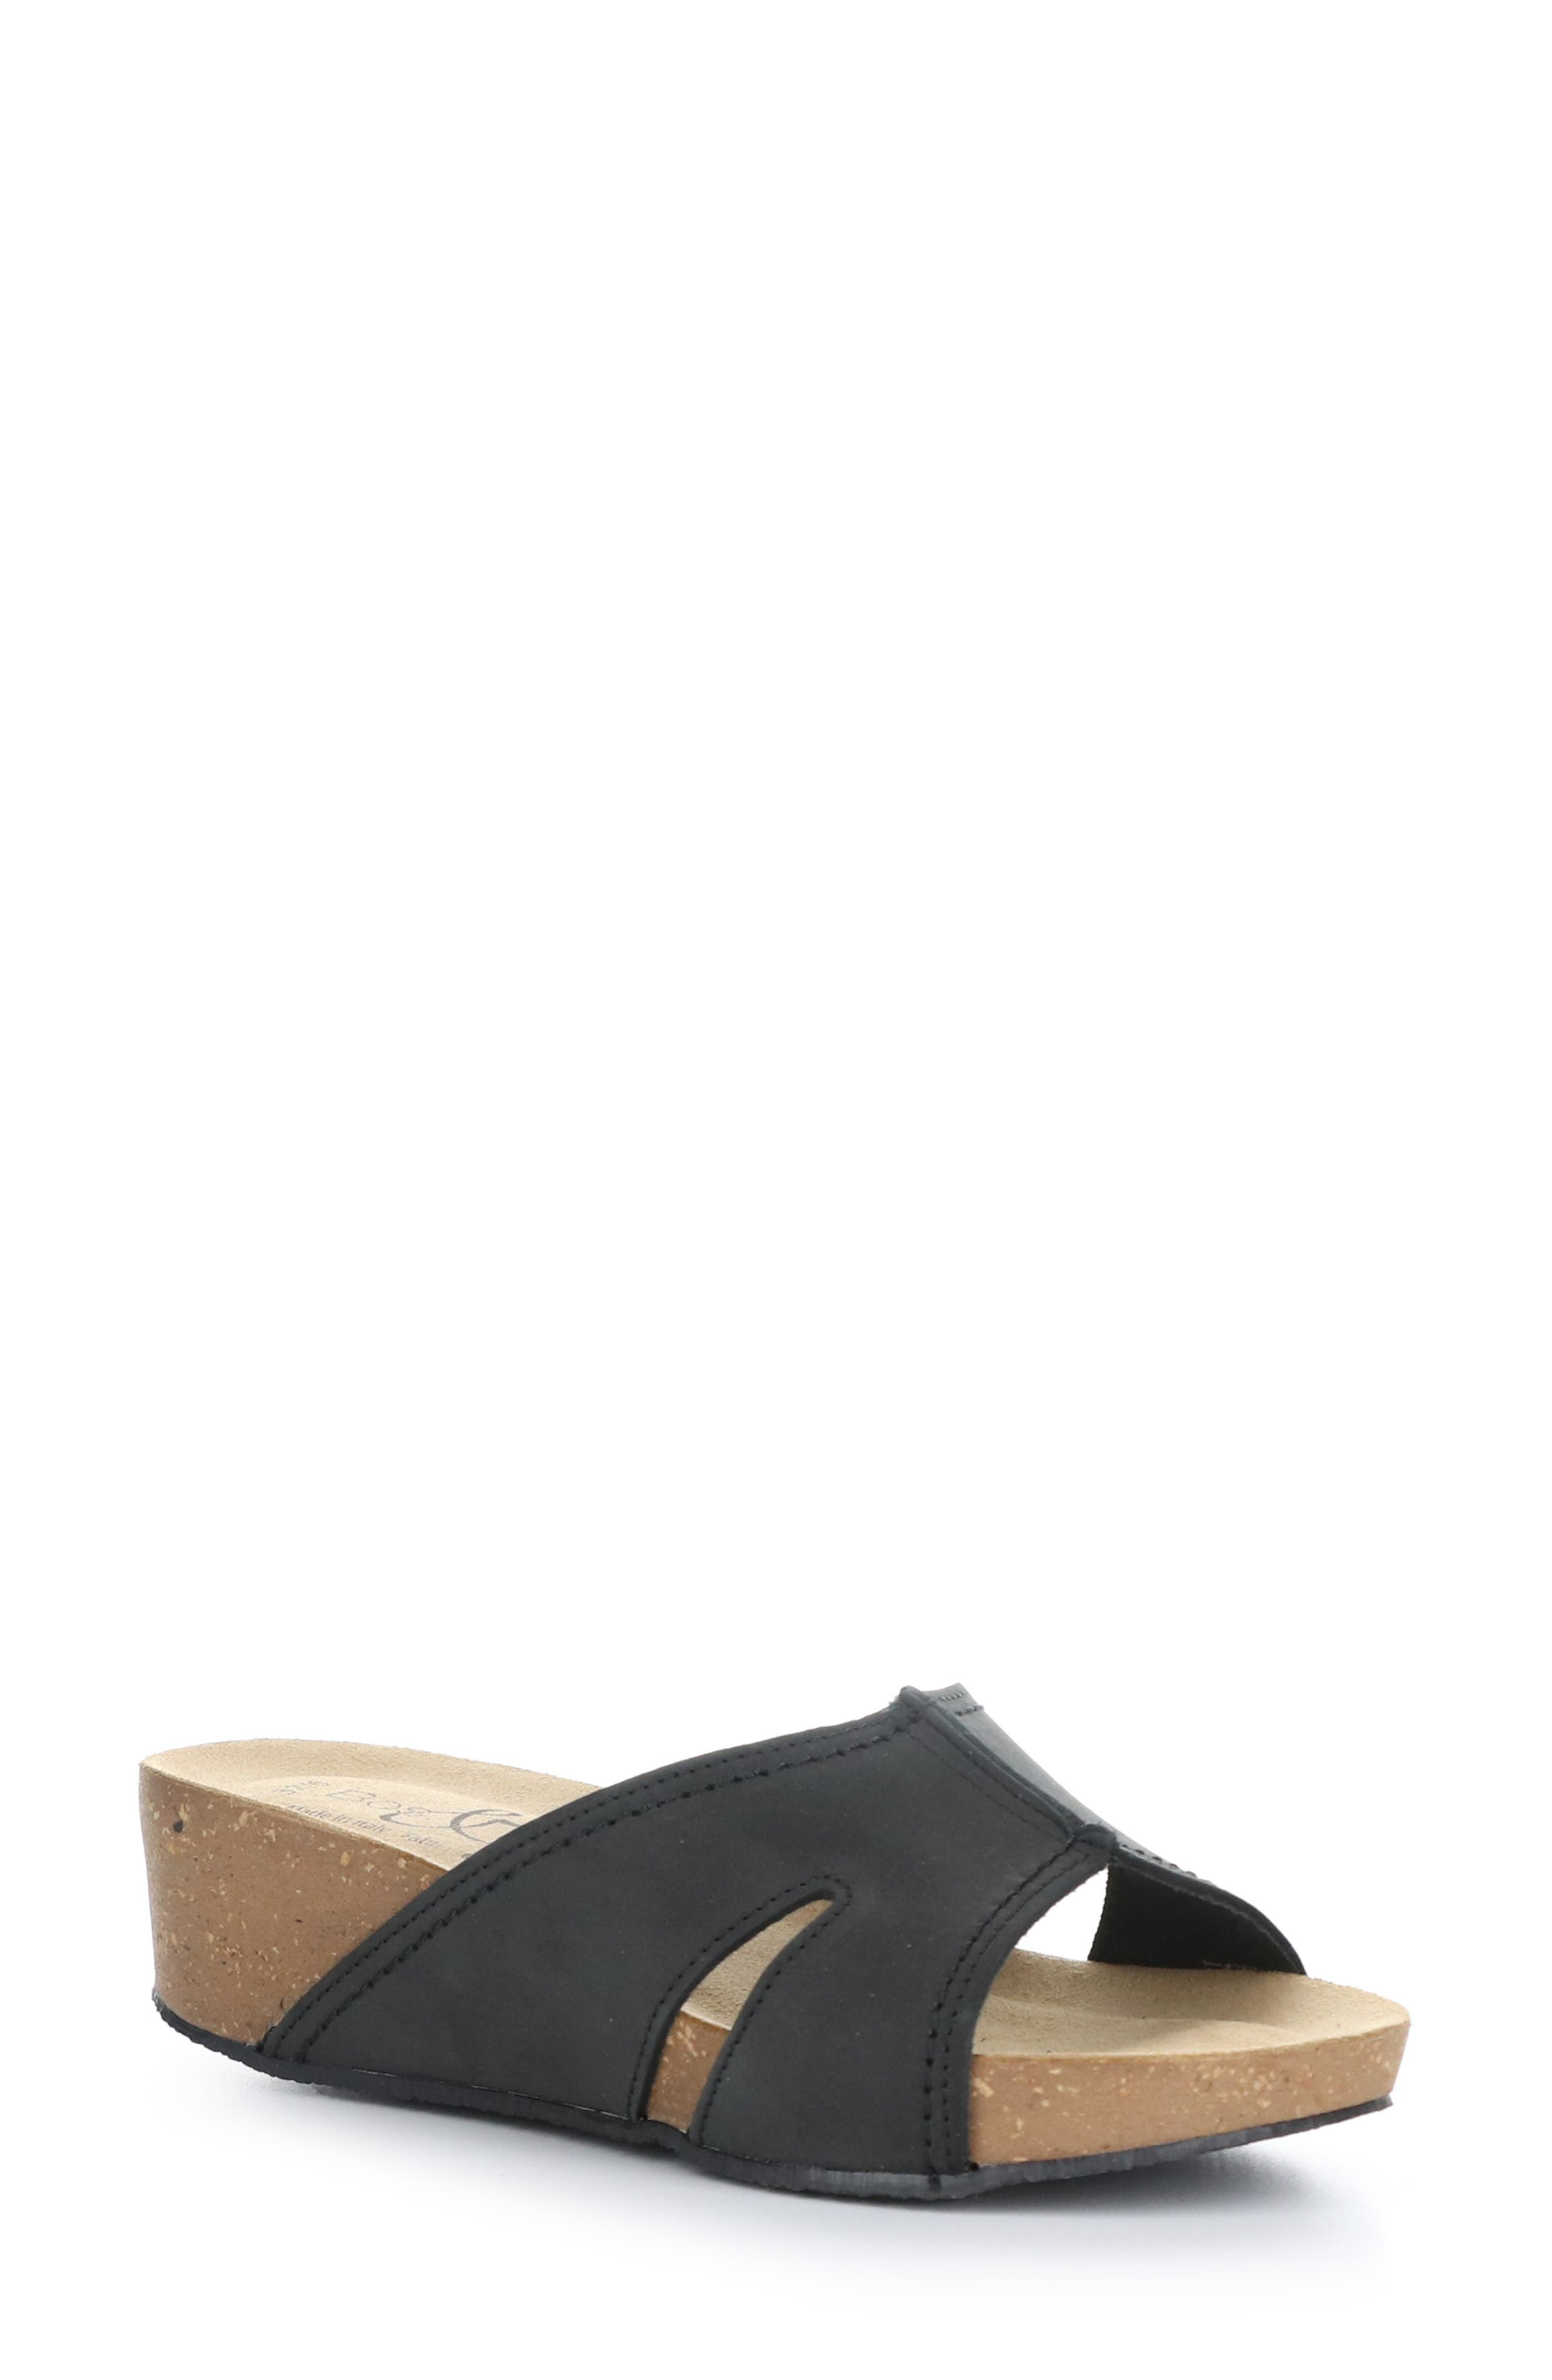 Lanbi Slide Sandal